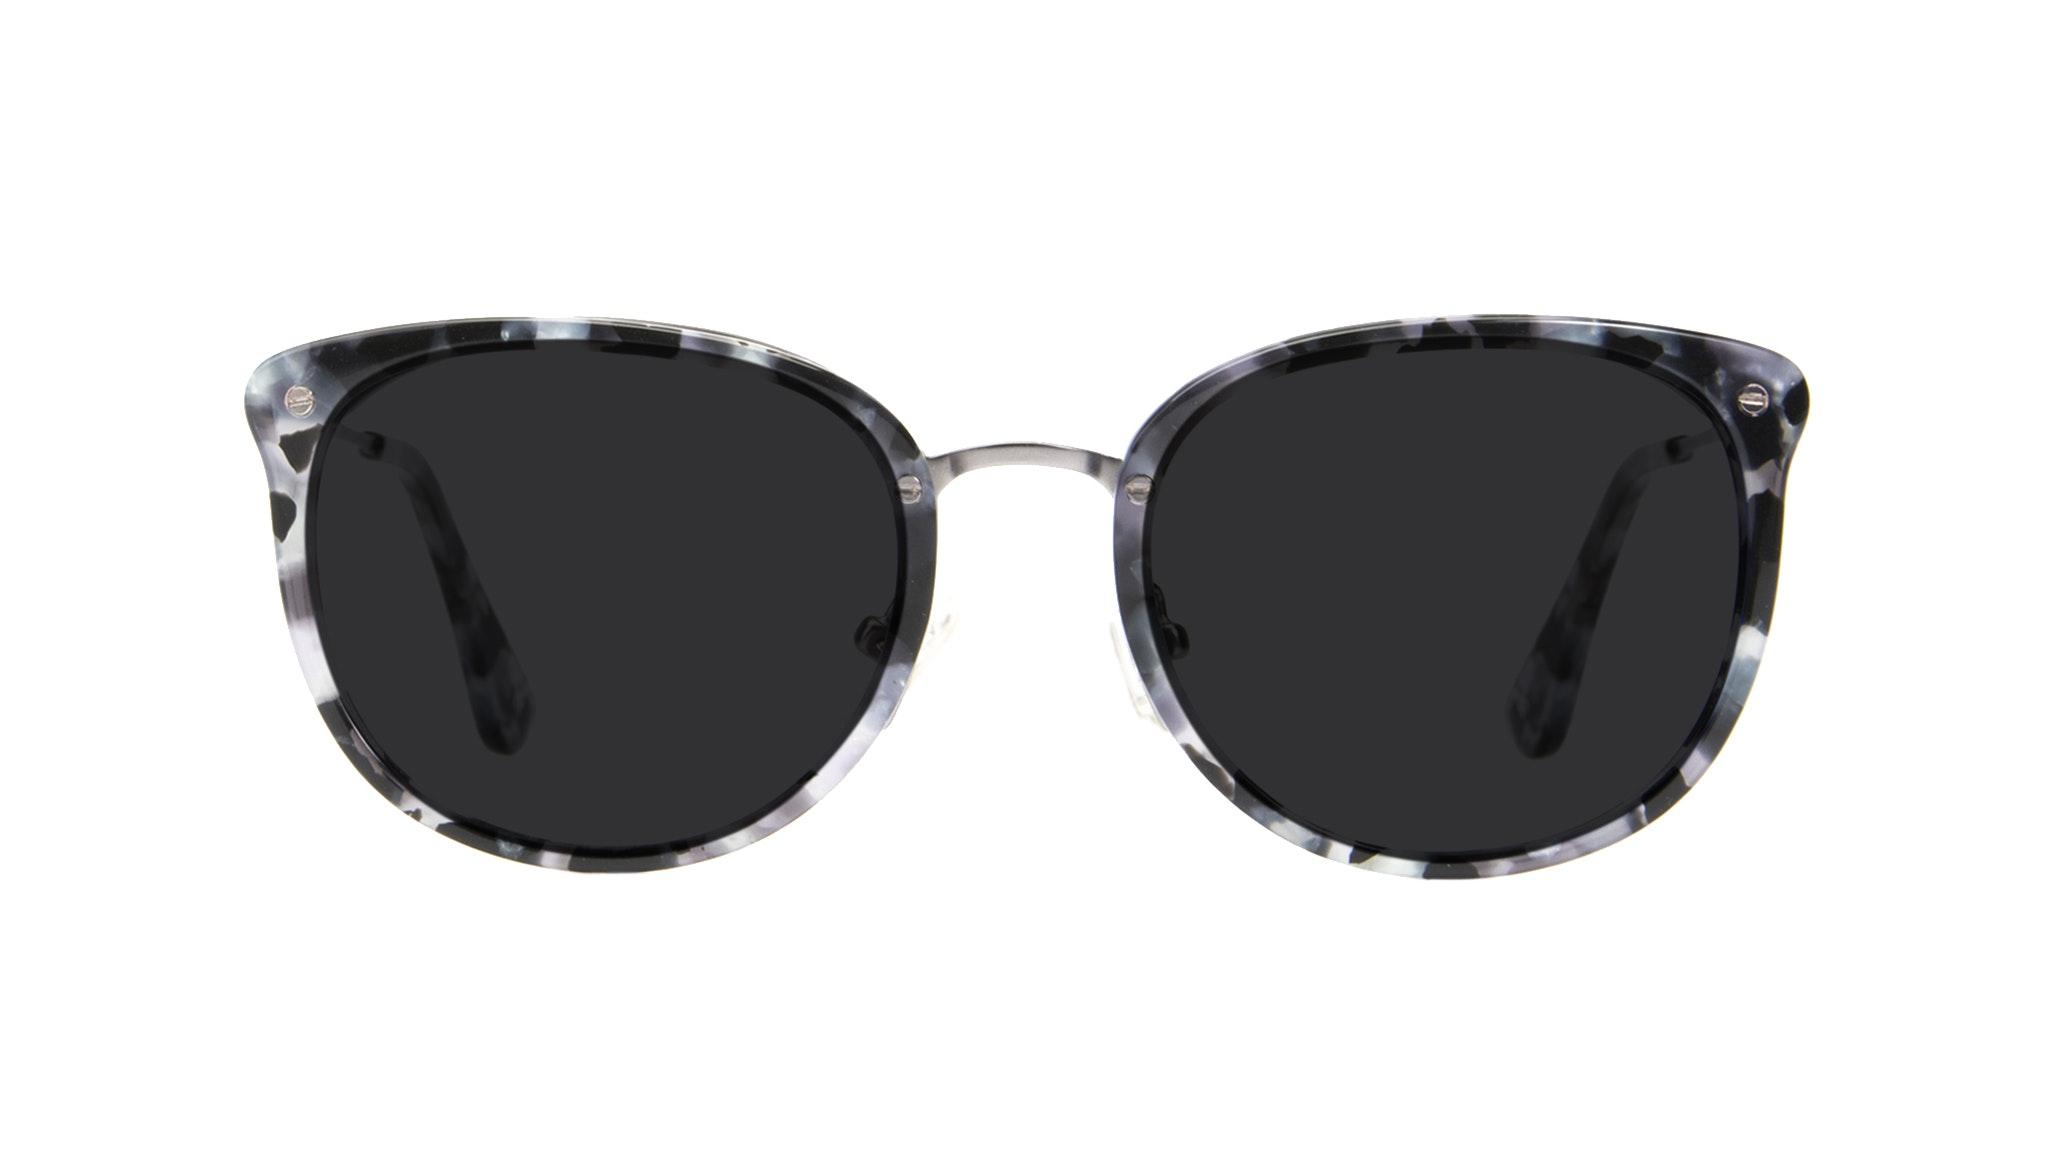 Affordable Fashion Glasses Square Round Sunglasses Women Amaze Silver Flake